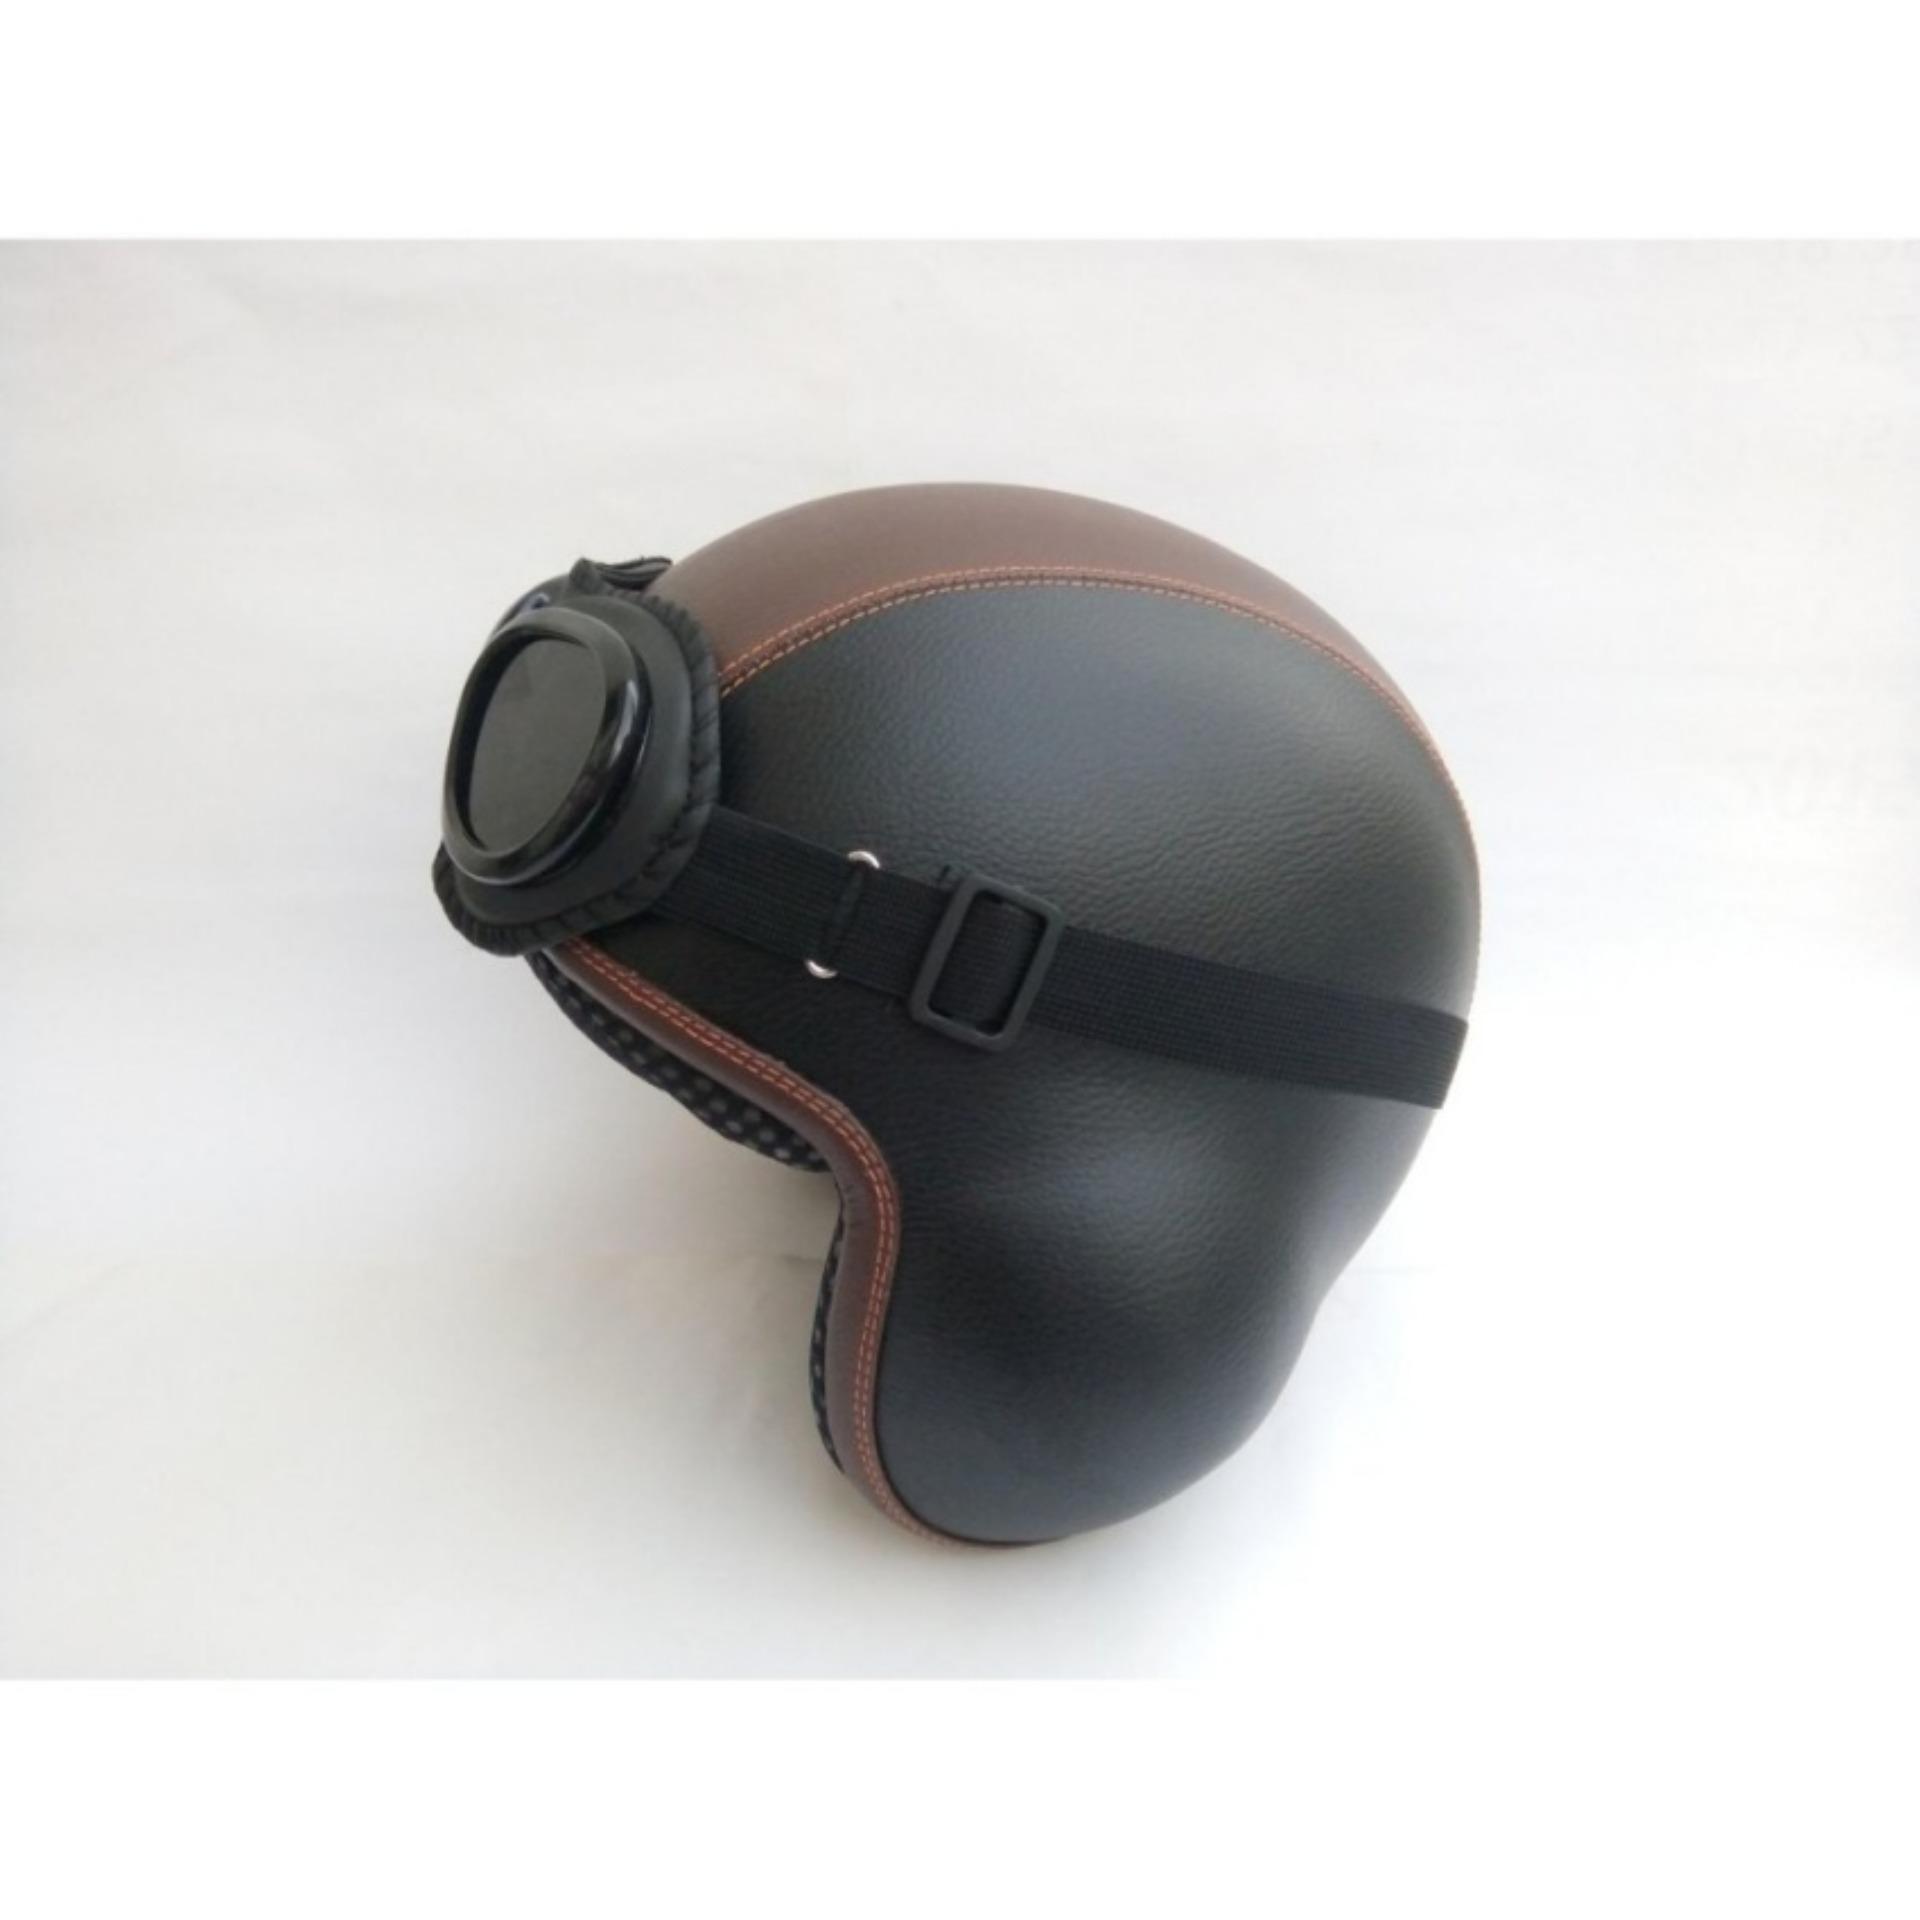 ... Helm Baru Broco Pilot Kacamata Retro Dewasa - Hitam Mix Coklat ...